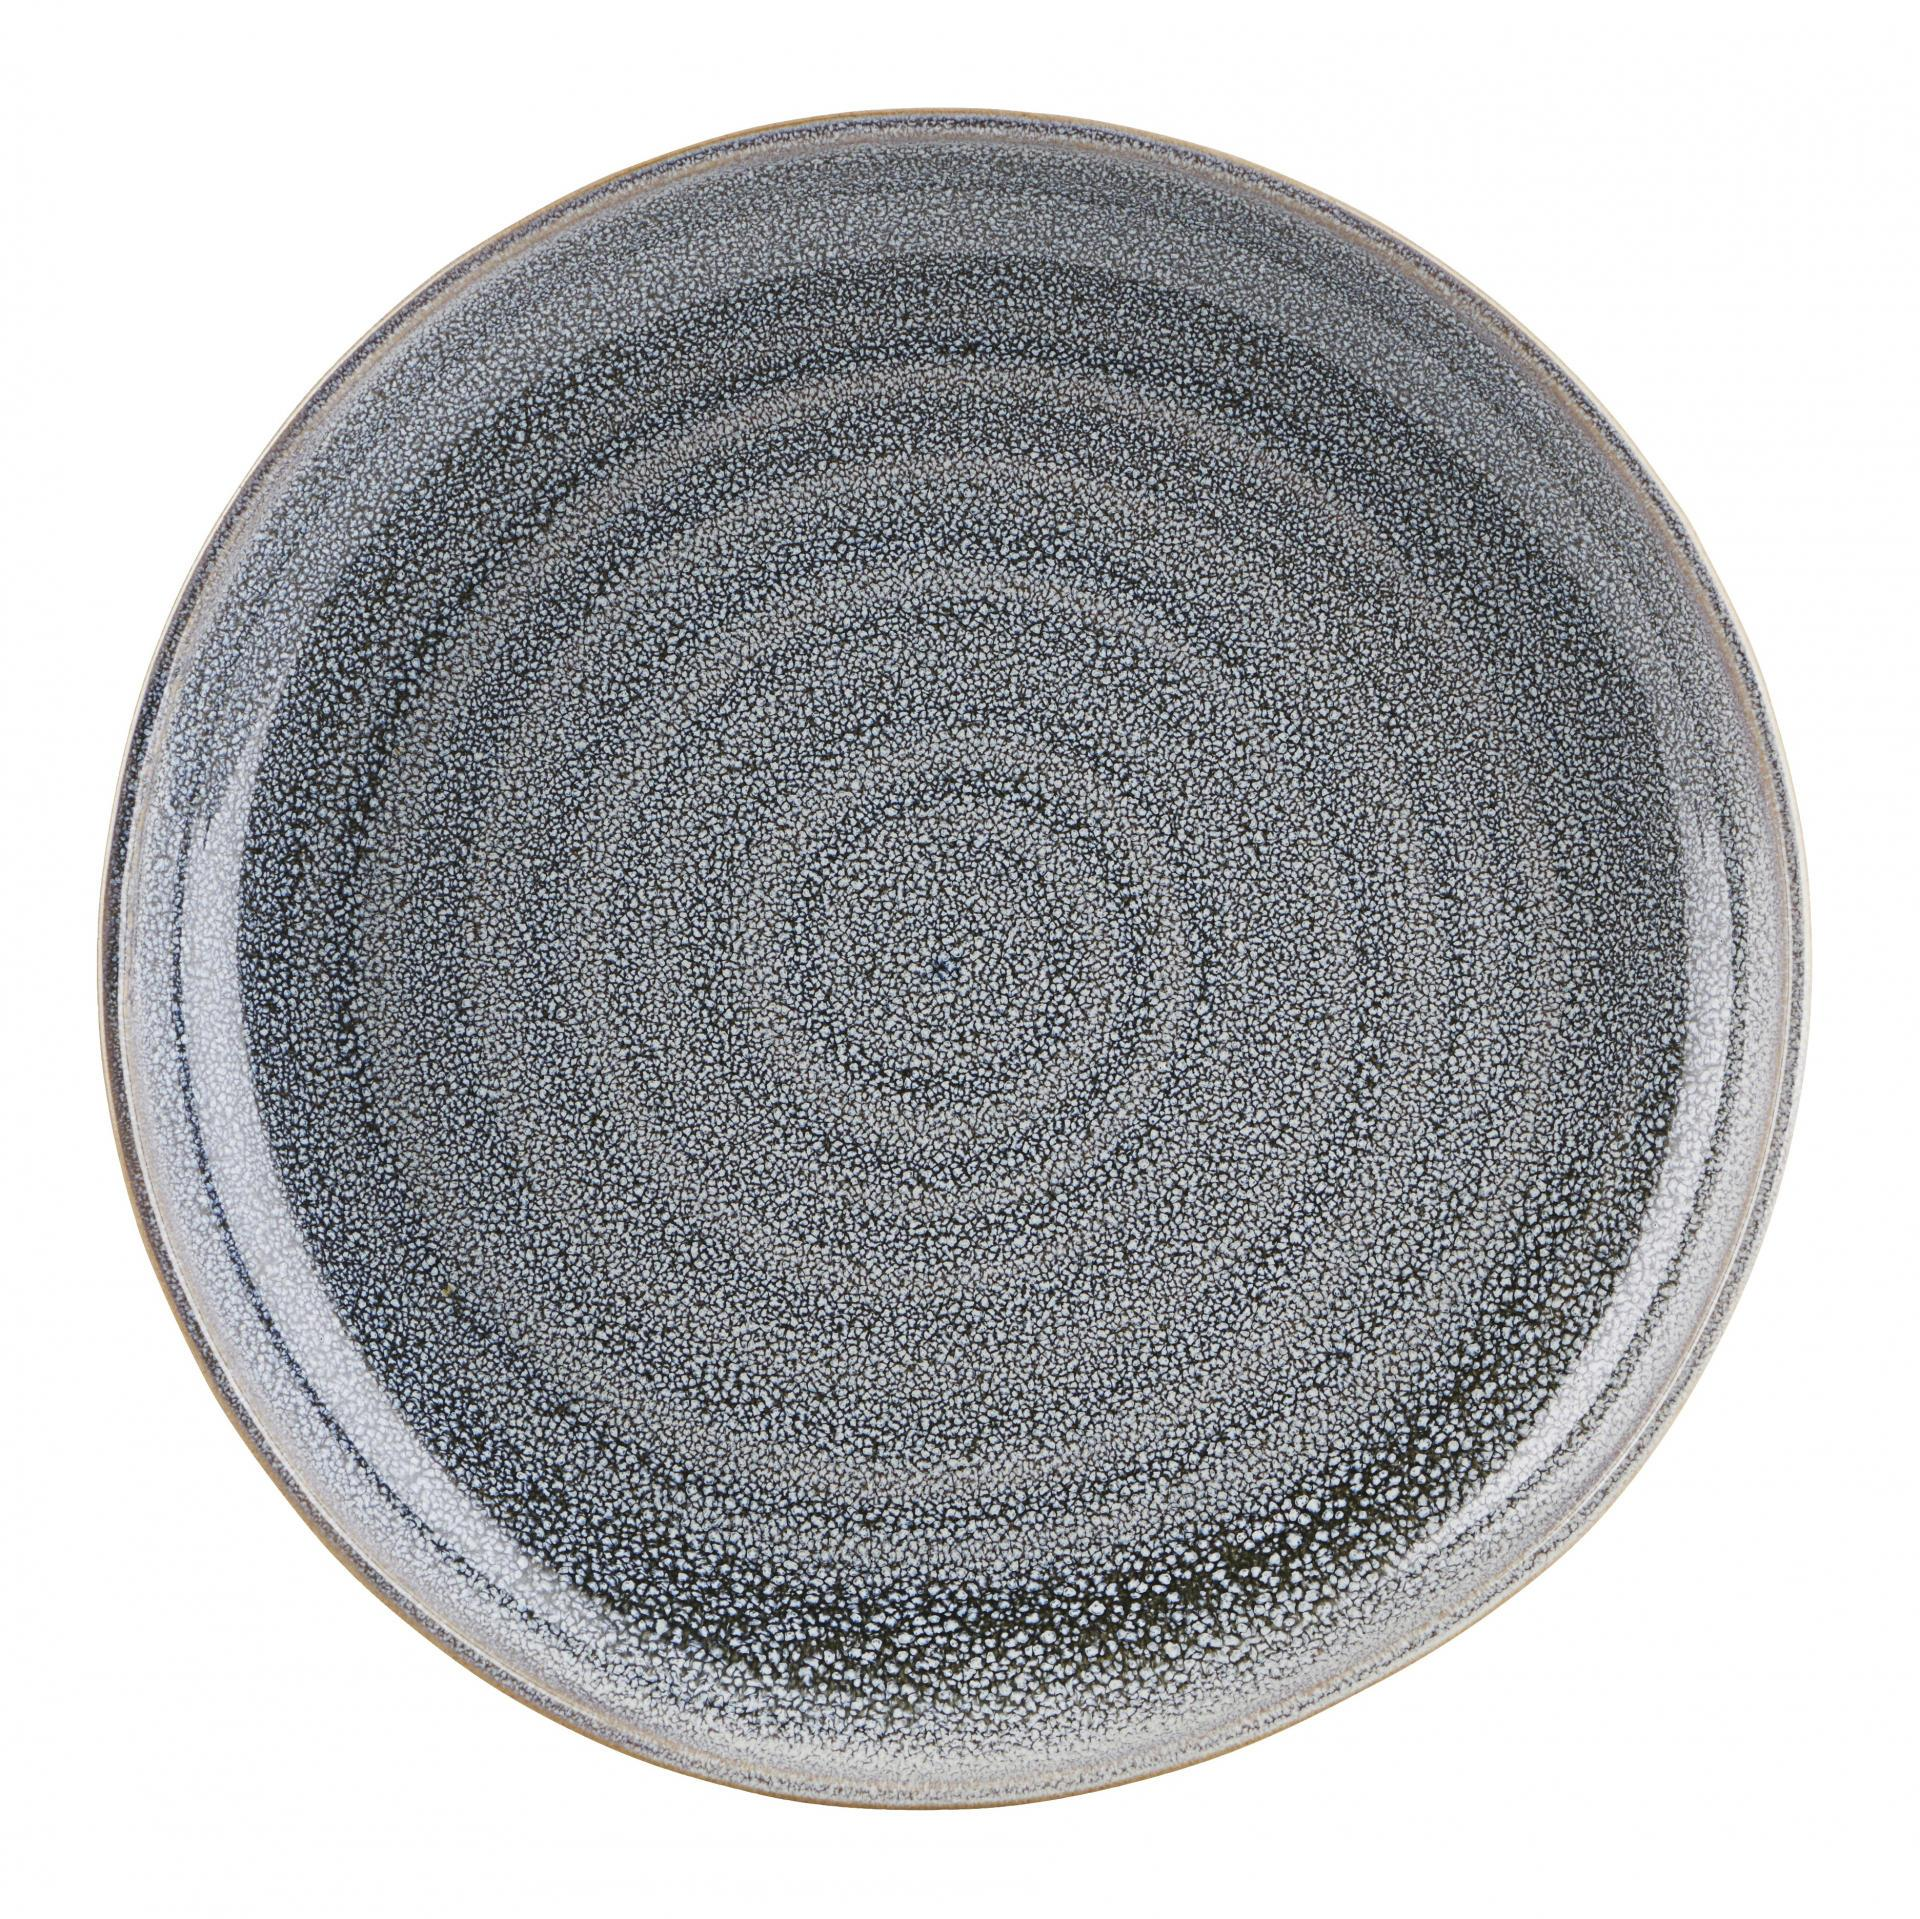 House Doctor Keramický talíř Nord Grey ⌀ 22 cm, šedá barva, keramika